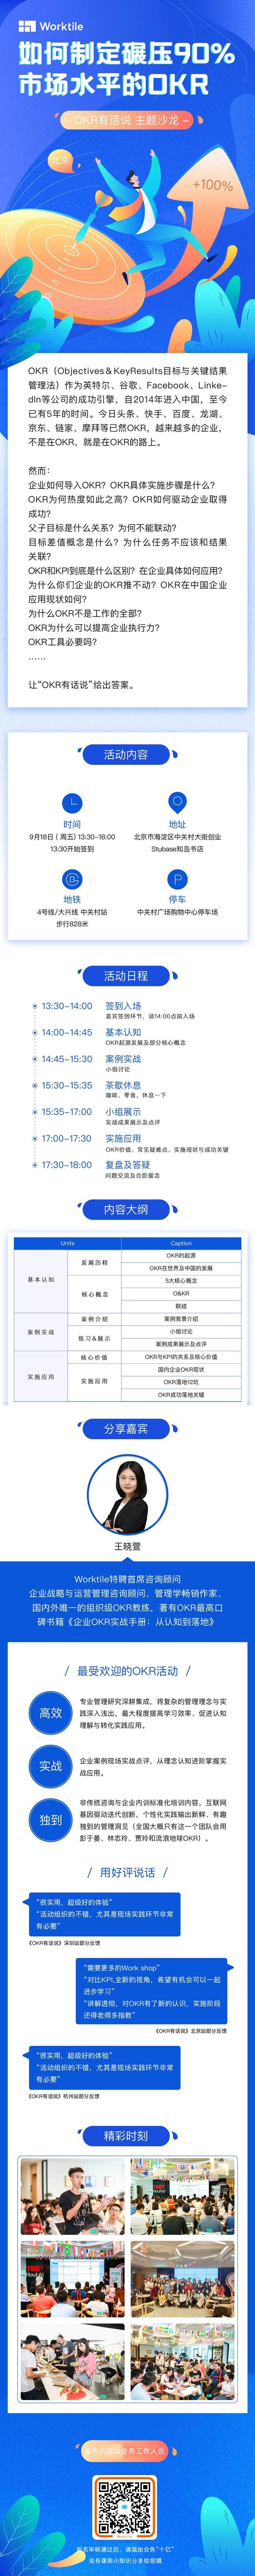 20200918晓萱-北京站.png